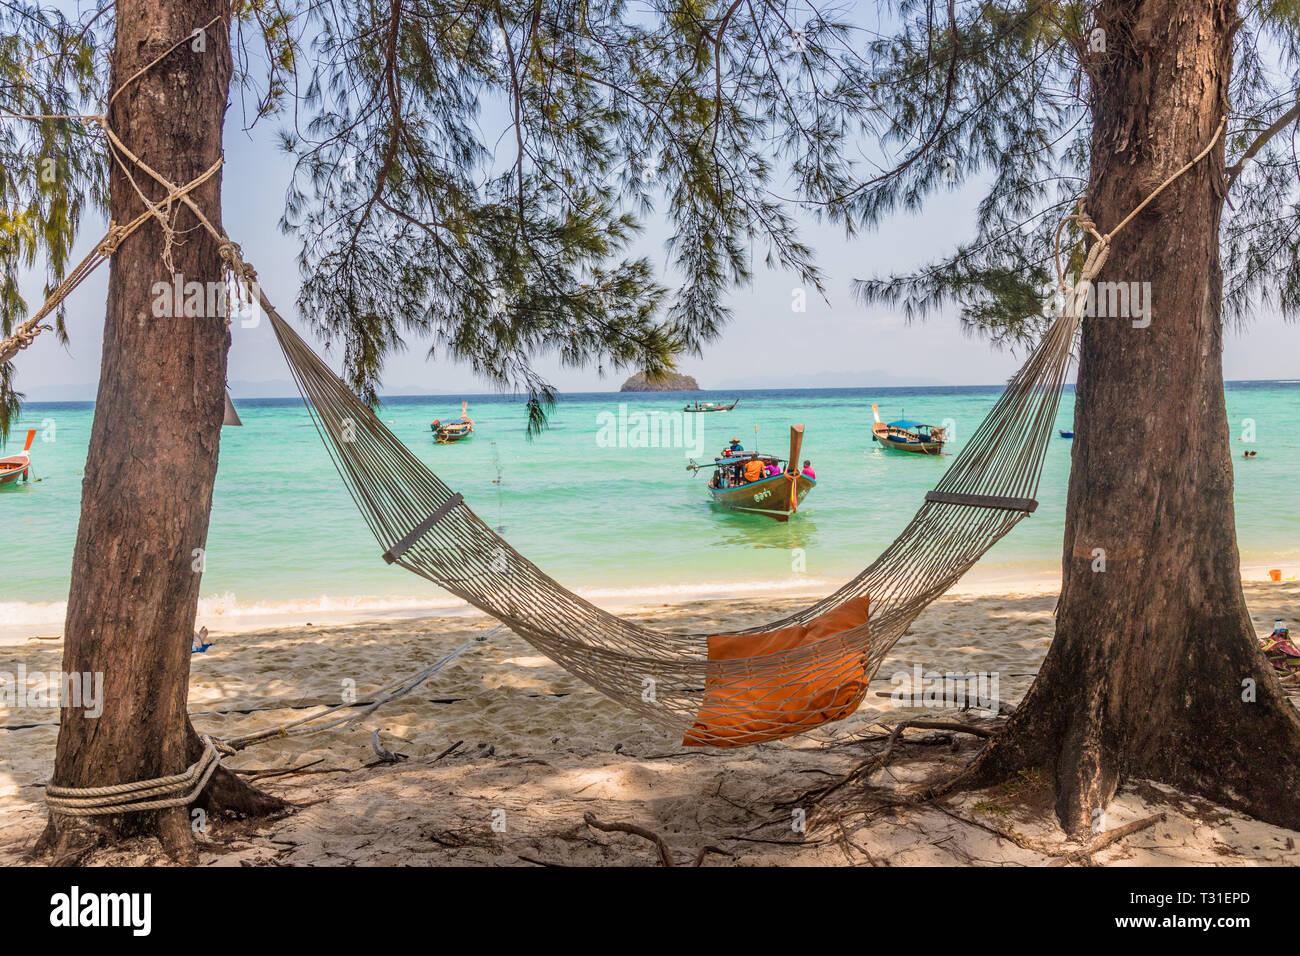 February 2019. Ko Lipe Thailand. A view of a hammock on the beach in Ko Lipe in Ko tarutao national park in Thailand Stock Photo